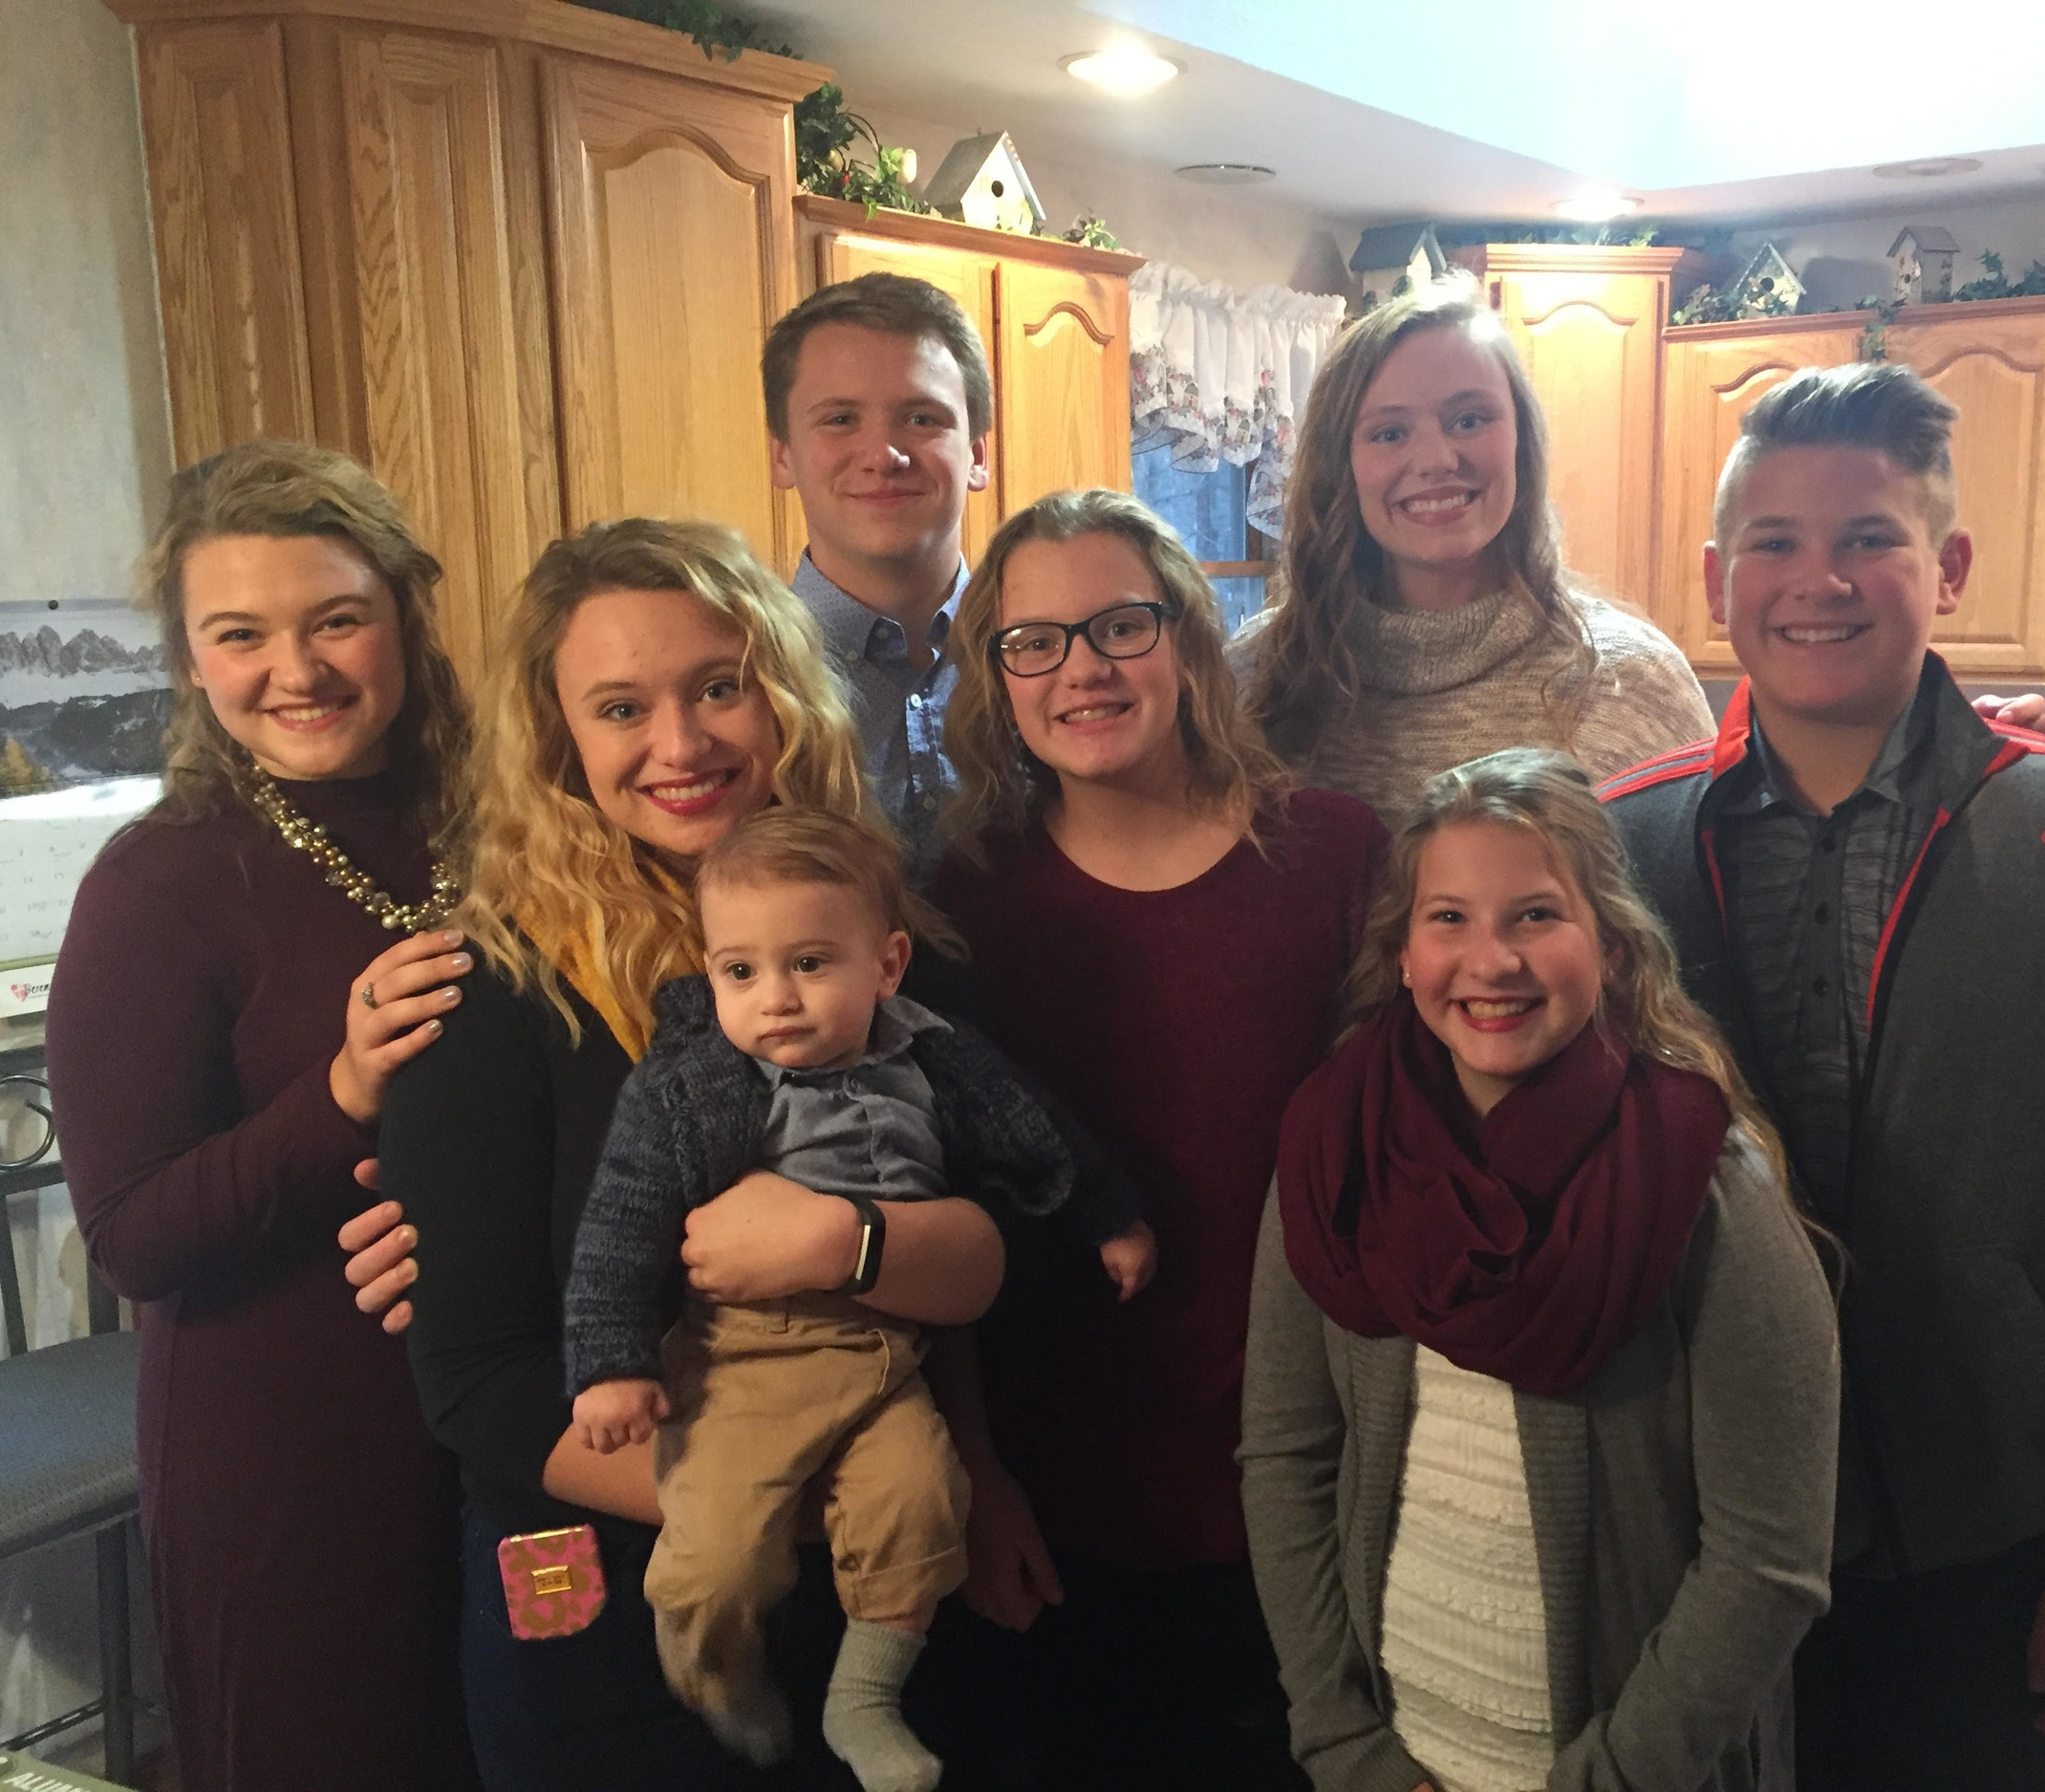 Jim's grandchildren